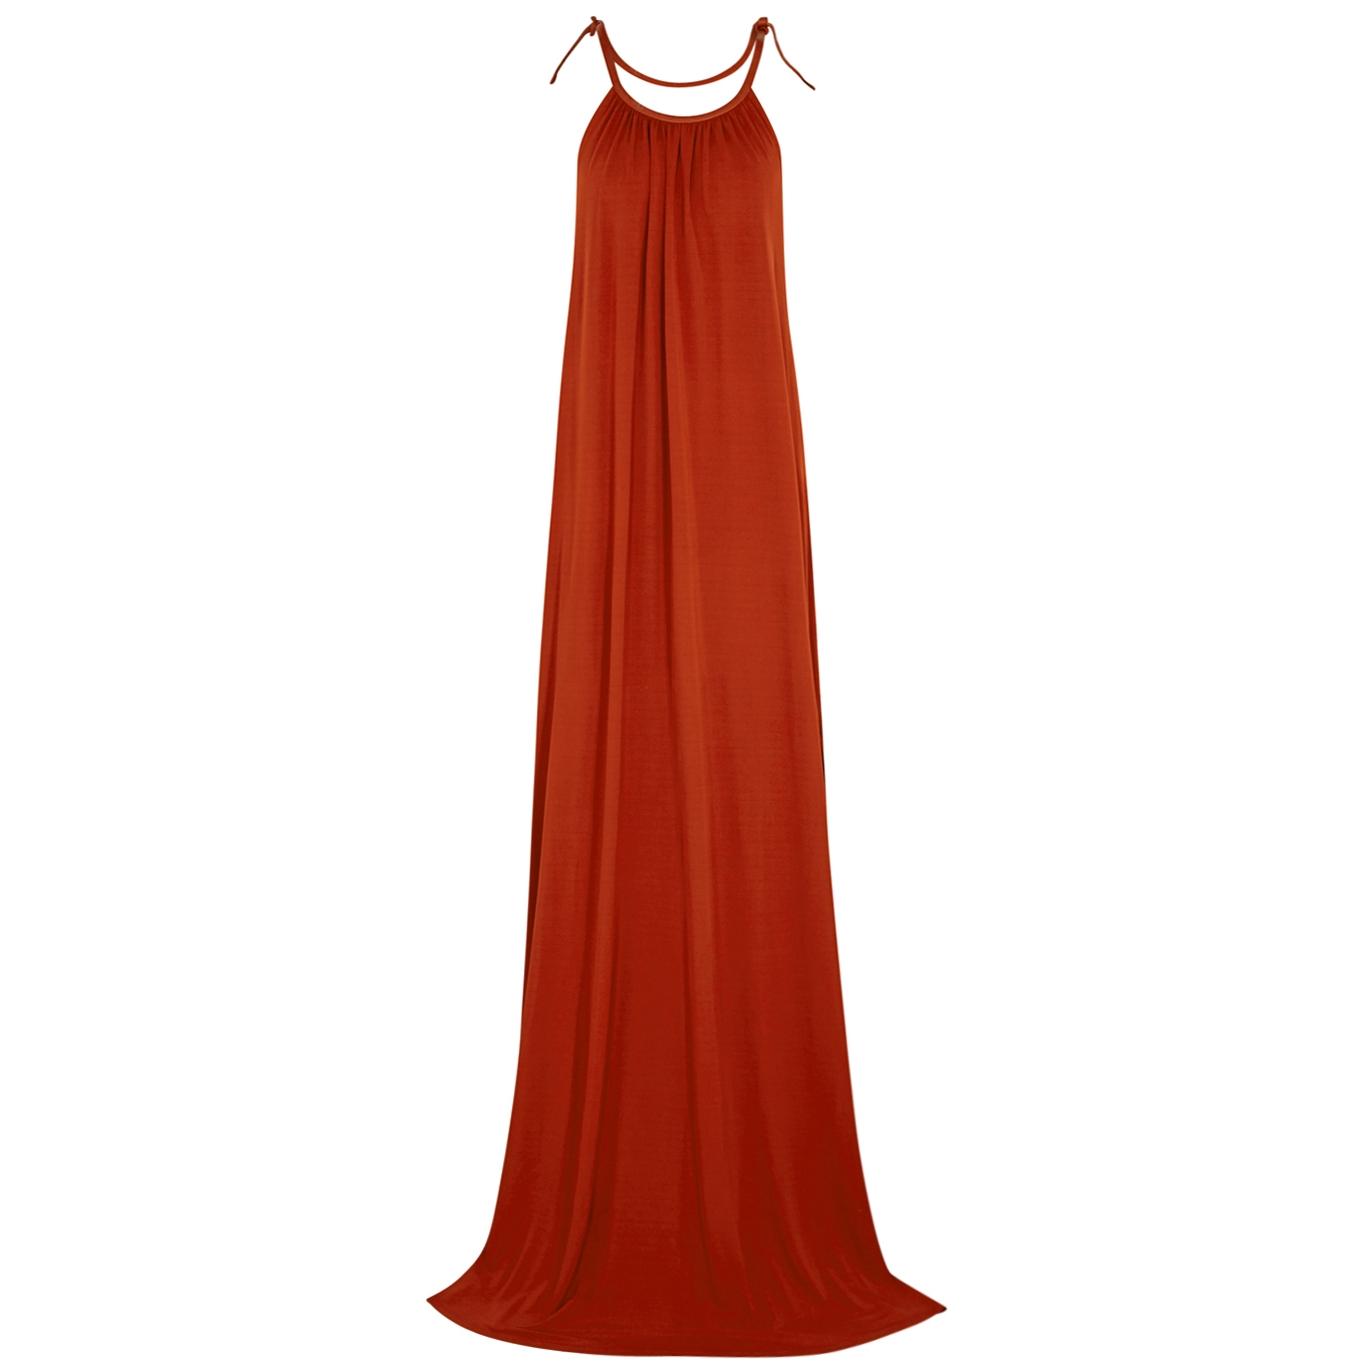 34c3326ad0f Rosetta Getty Burnt orange maxi dress - Harvey Nichols